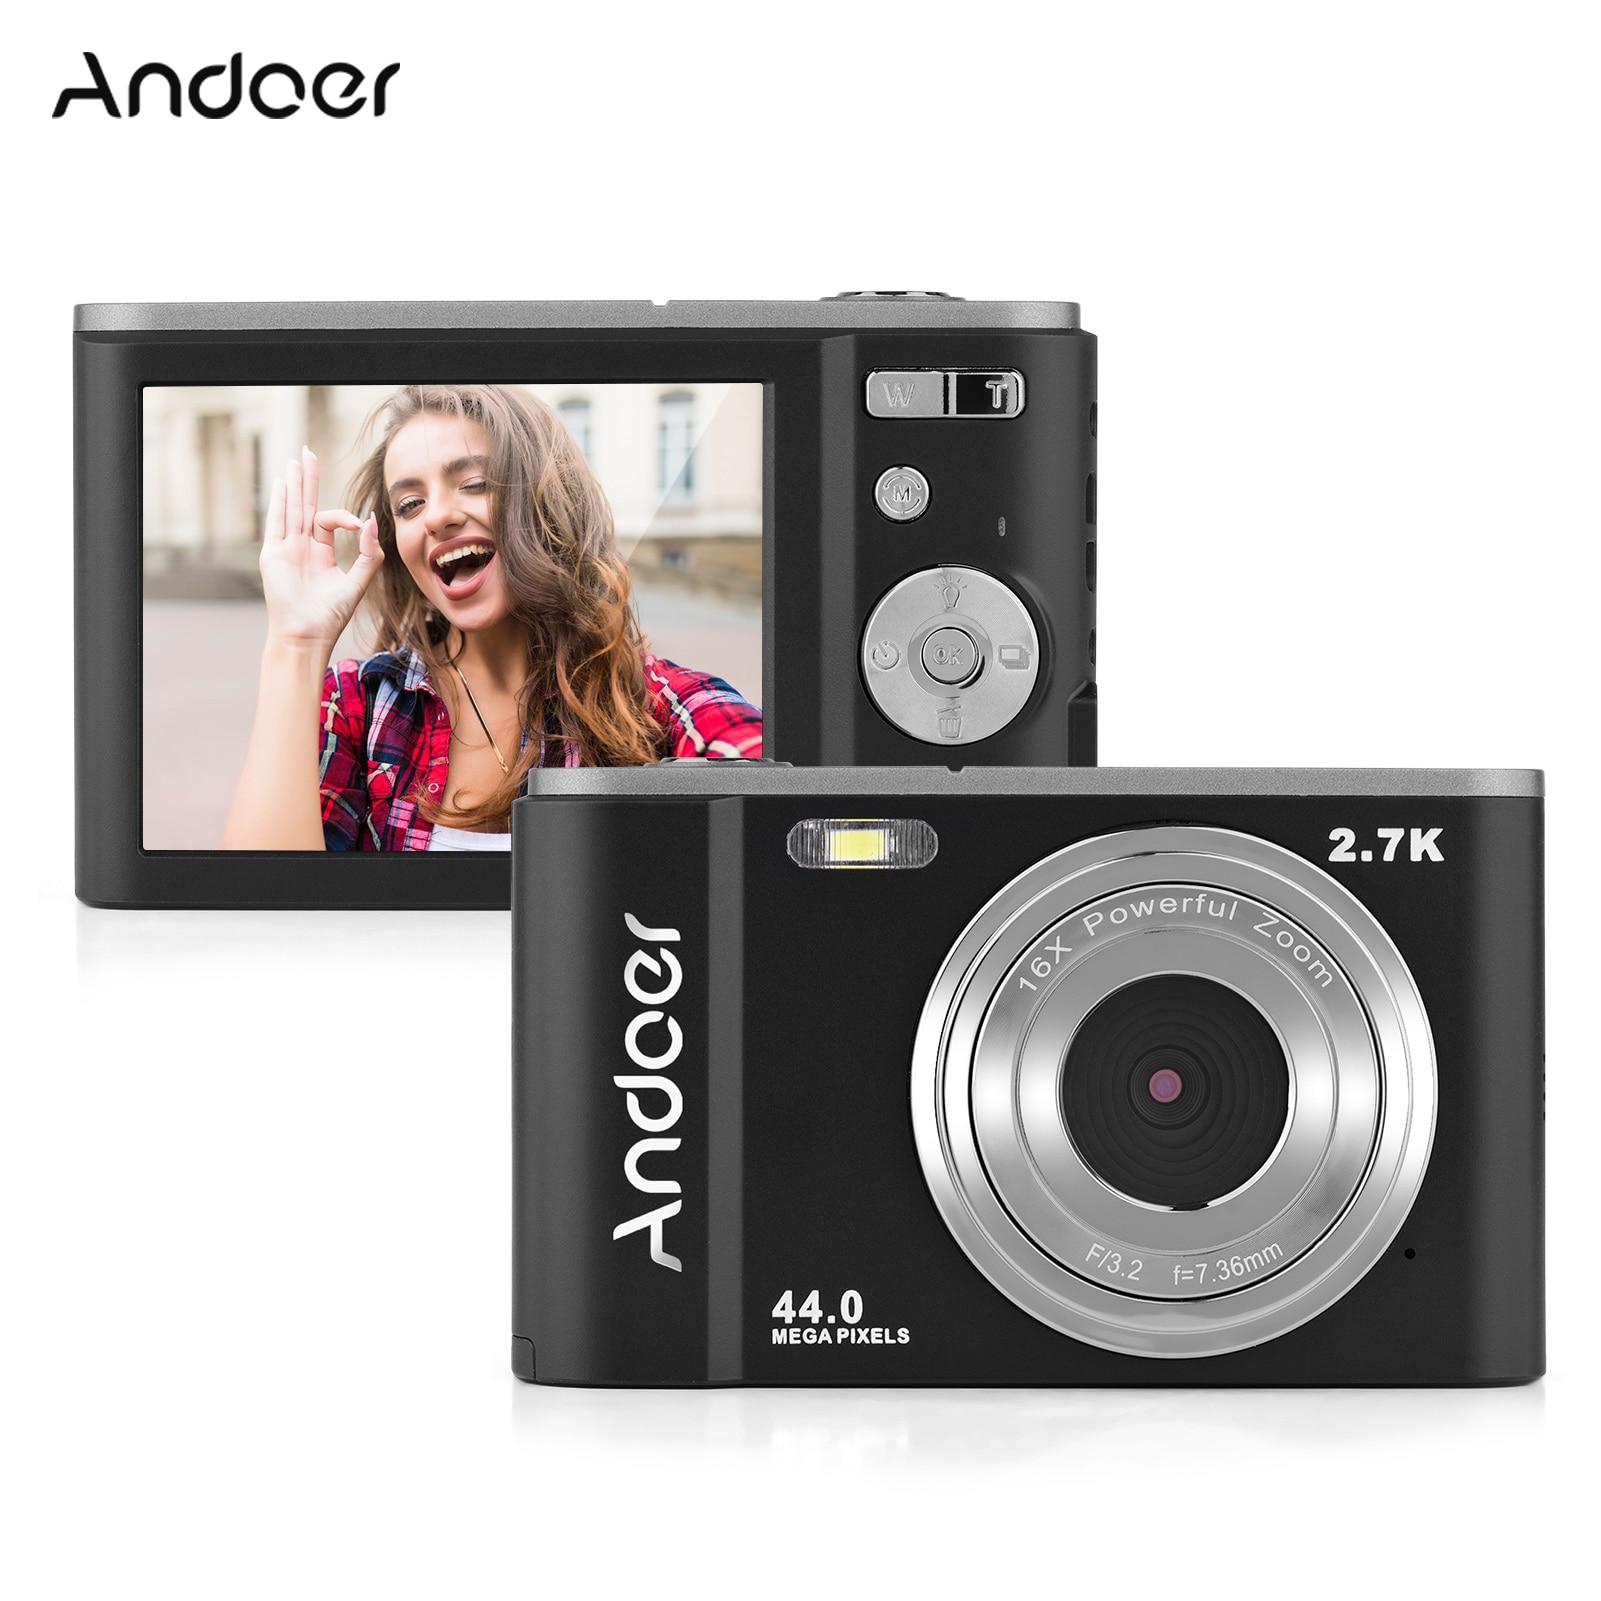 Andoer كاميرا رقمية صغيرة 44MP 2.7K 2.88-inch IPS شاشة 16X التكبير الموقت الذاتي 128GB الذاكرة الموسعة كشف الوجه المضادة للاهتزاز